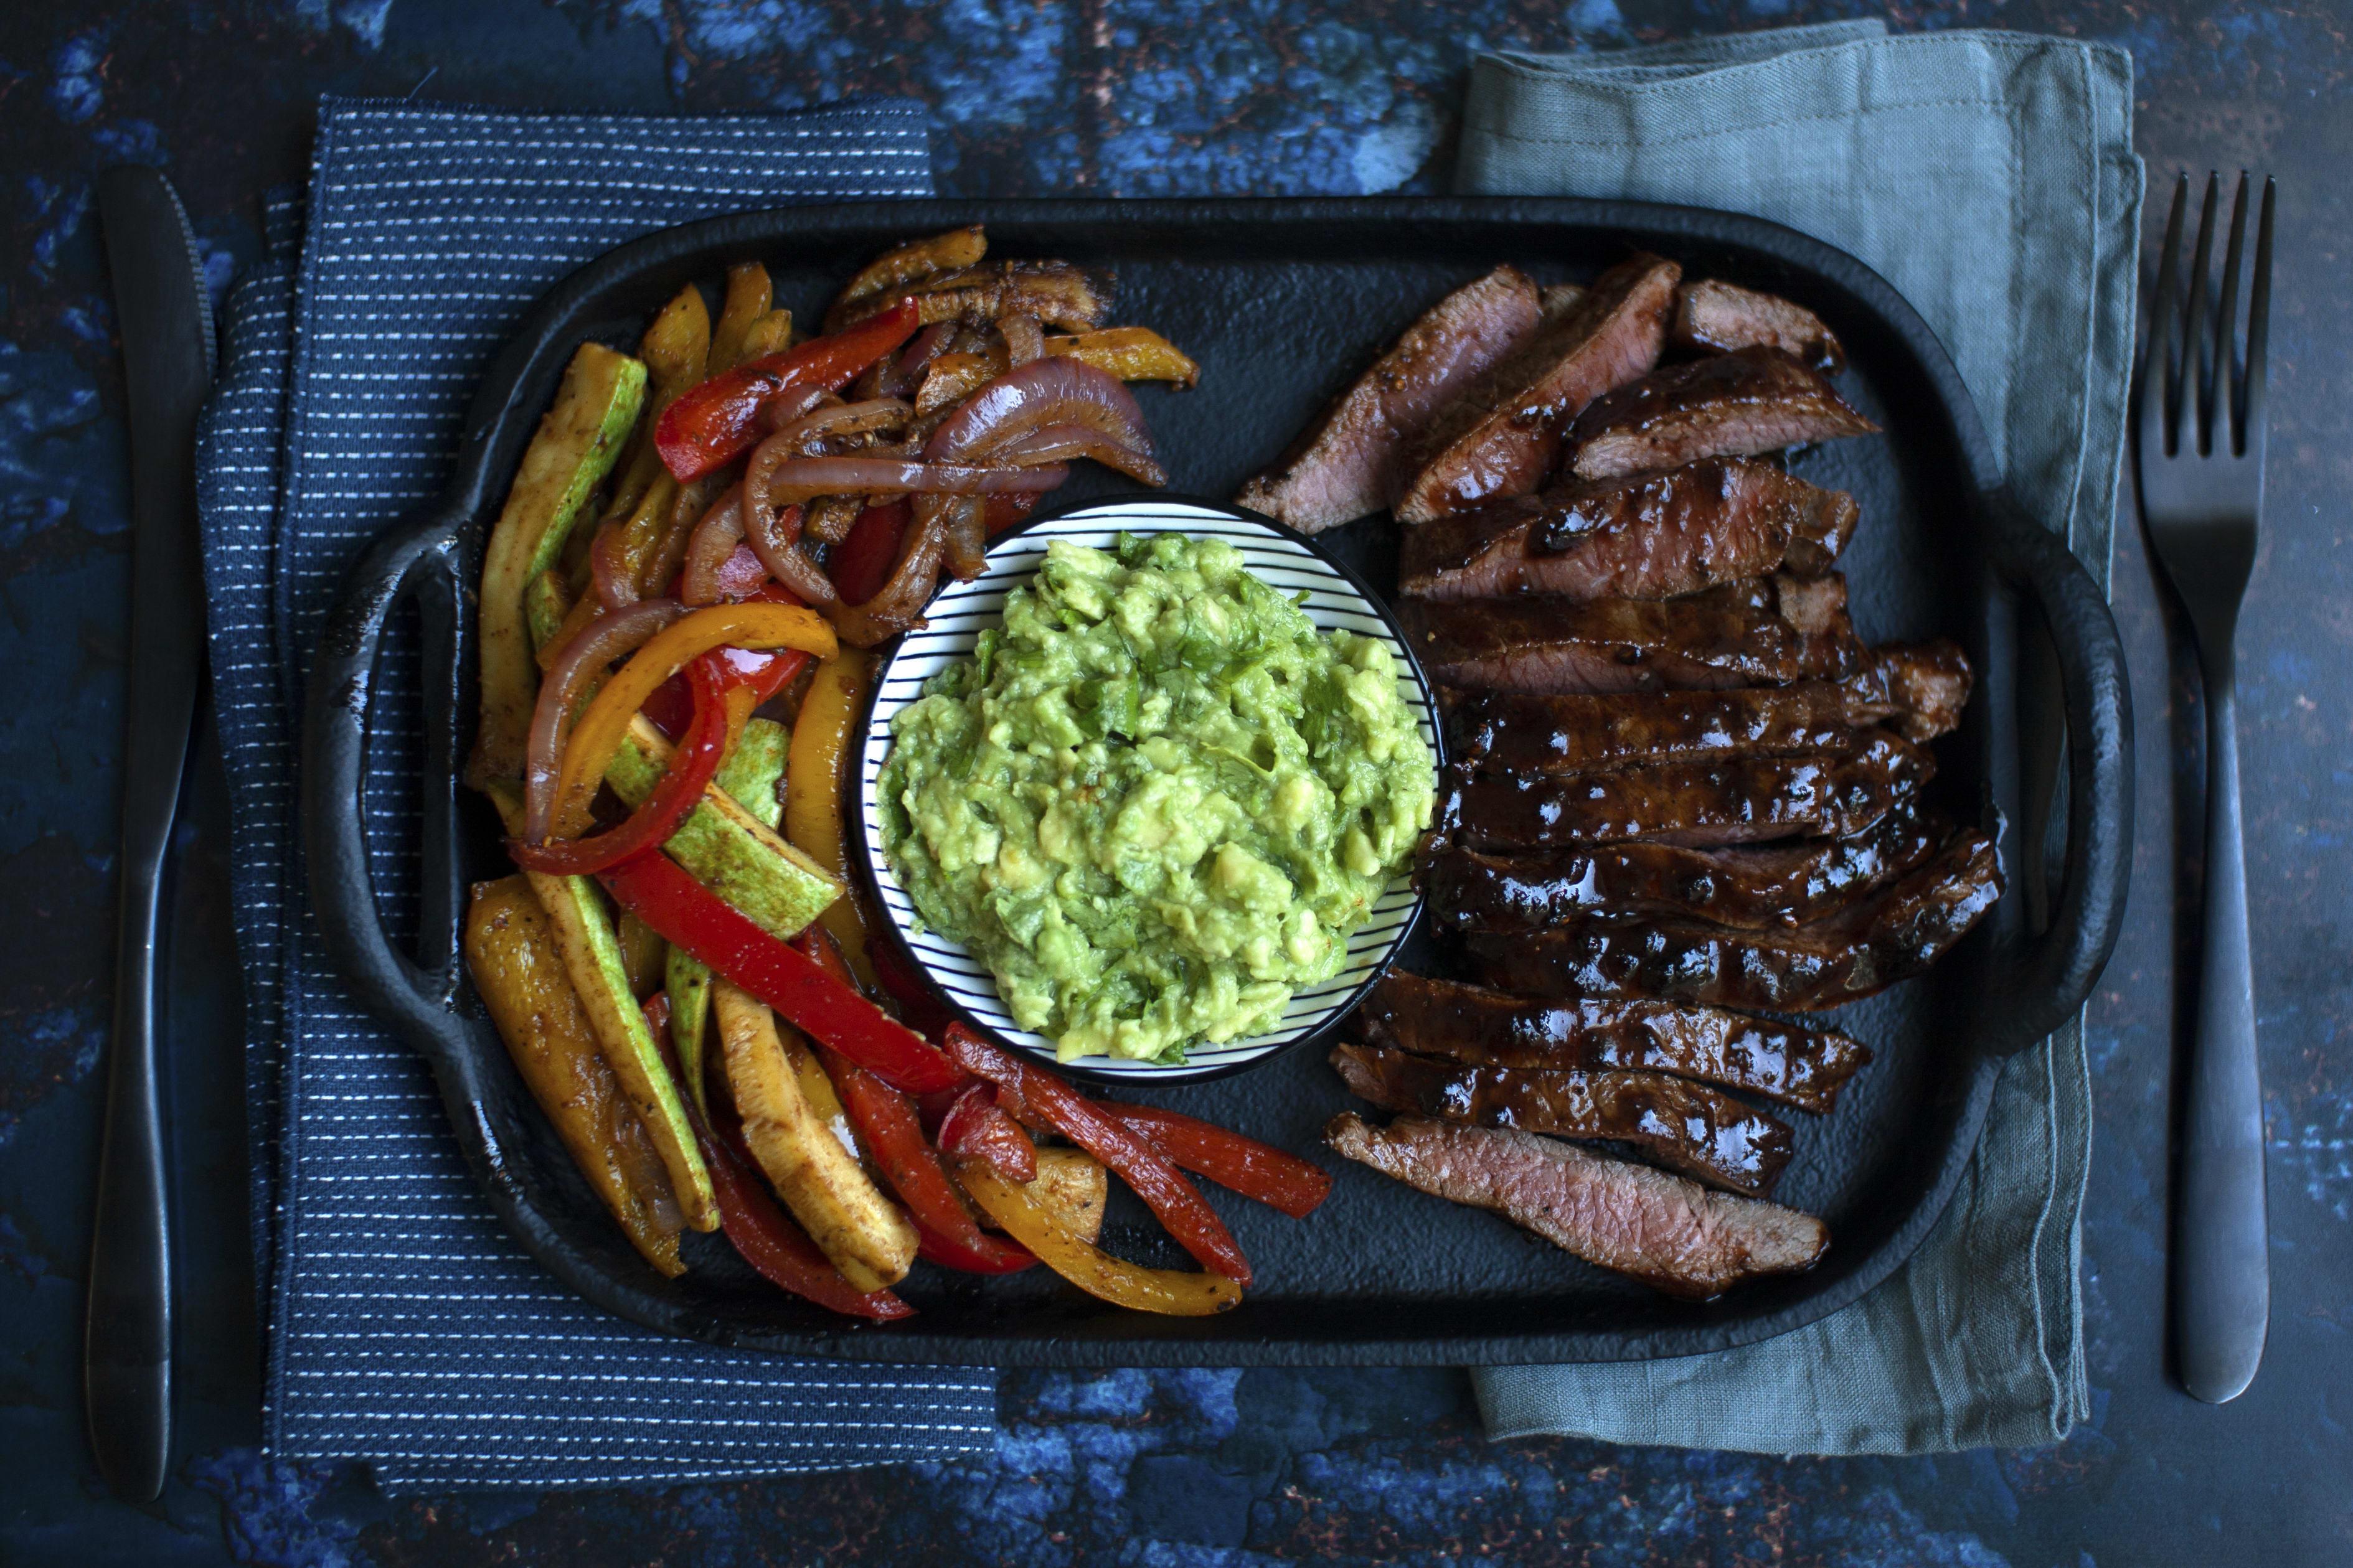 Barbecue Steak with Fajita Vegetables and Guacamole